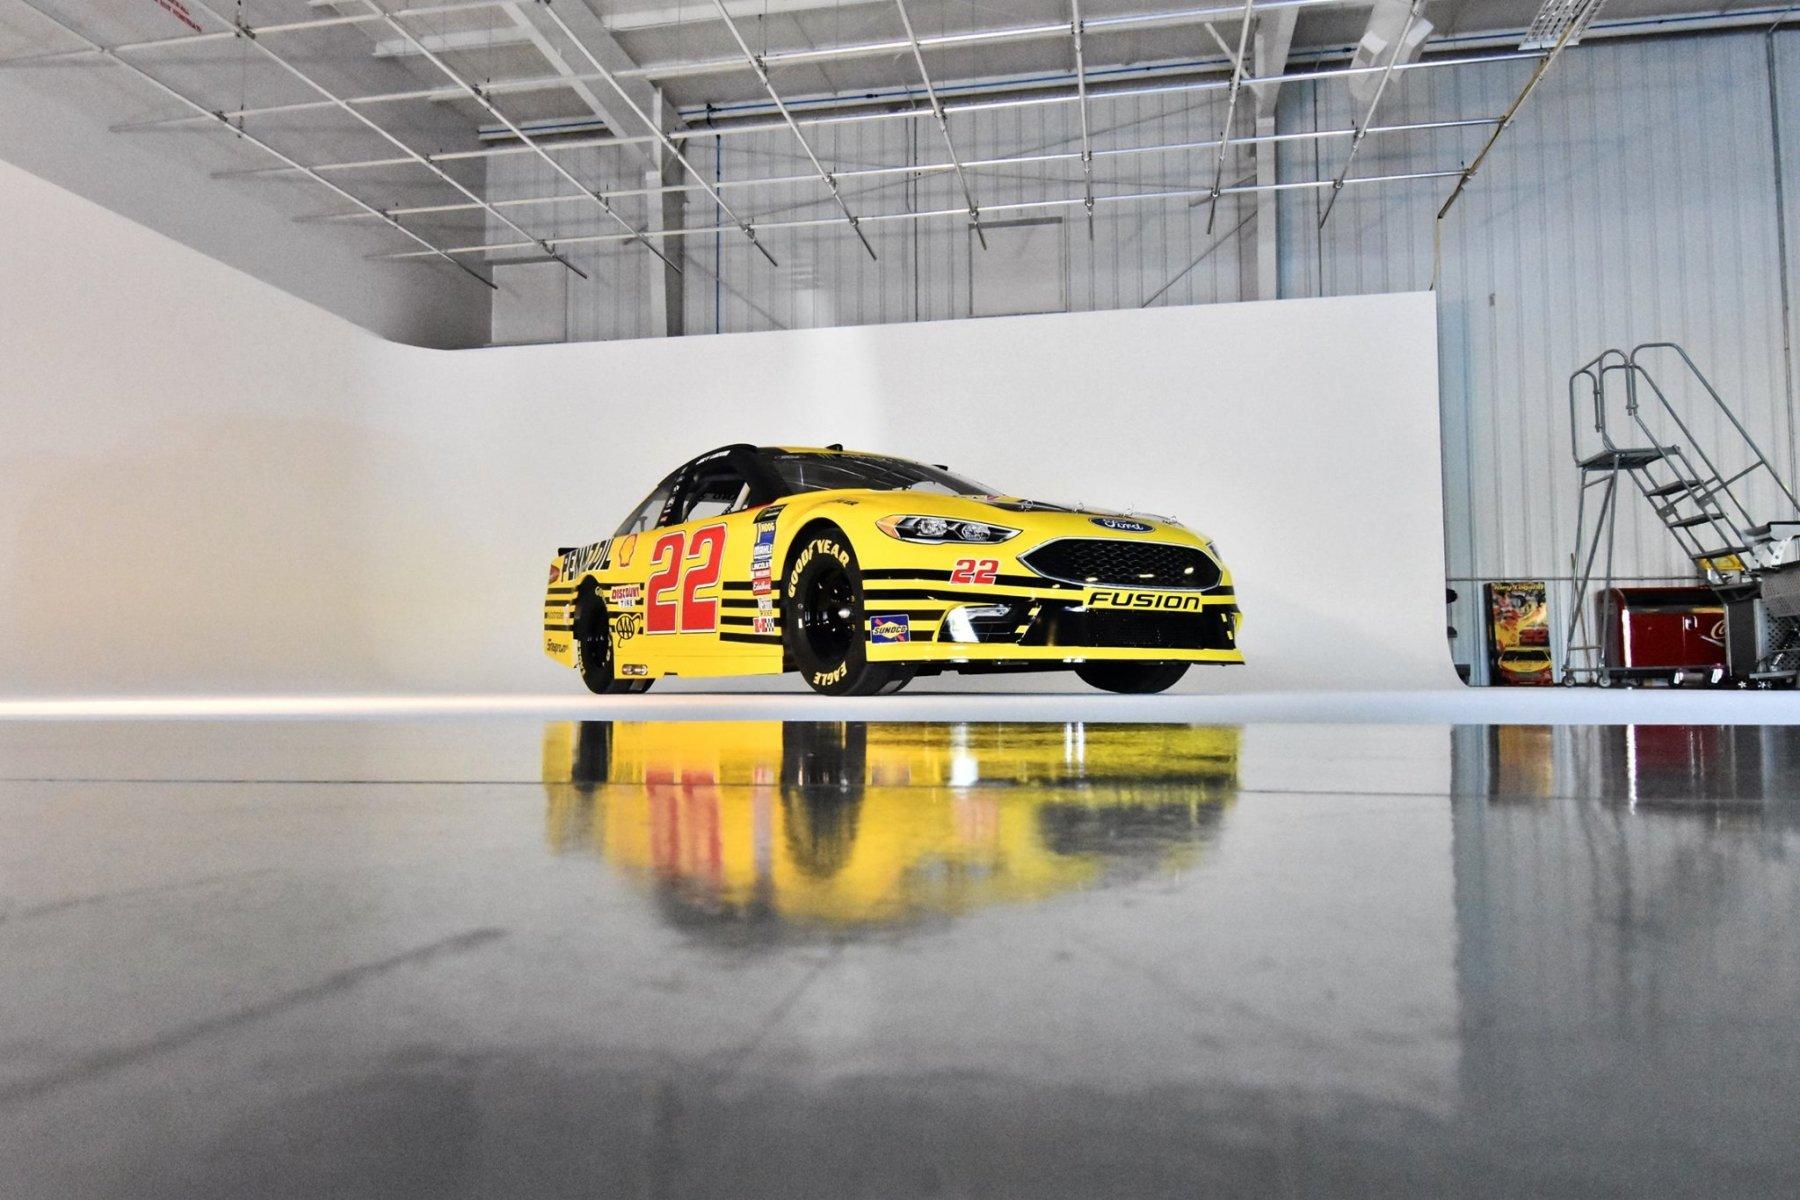 Joey Logano - 2018 Darlington Raceway paint scheme